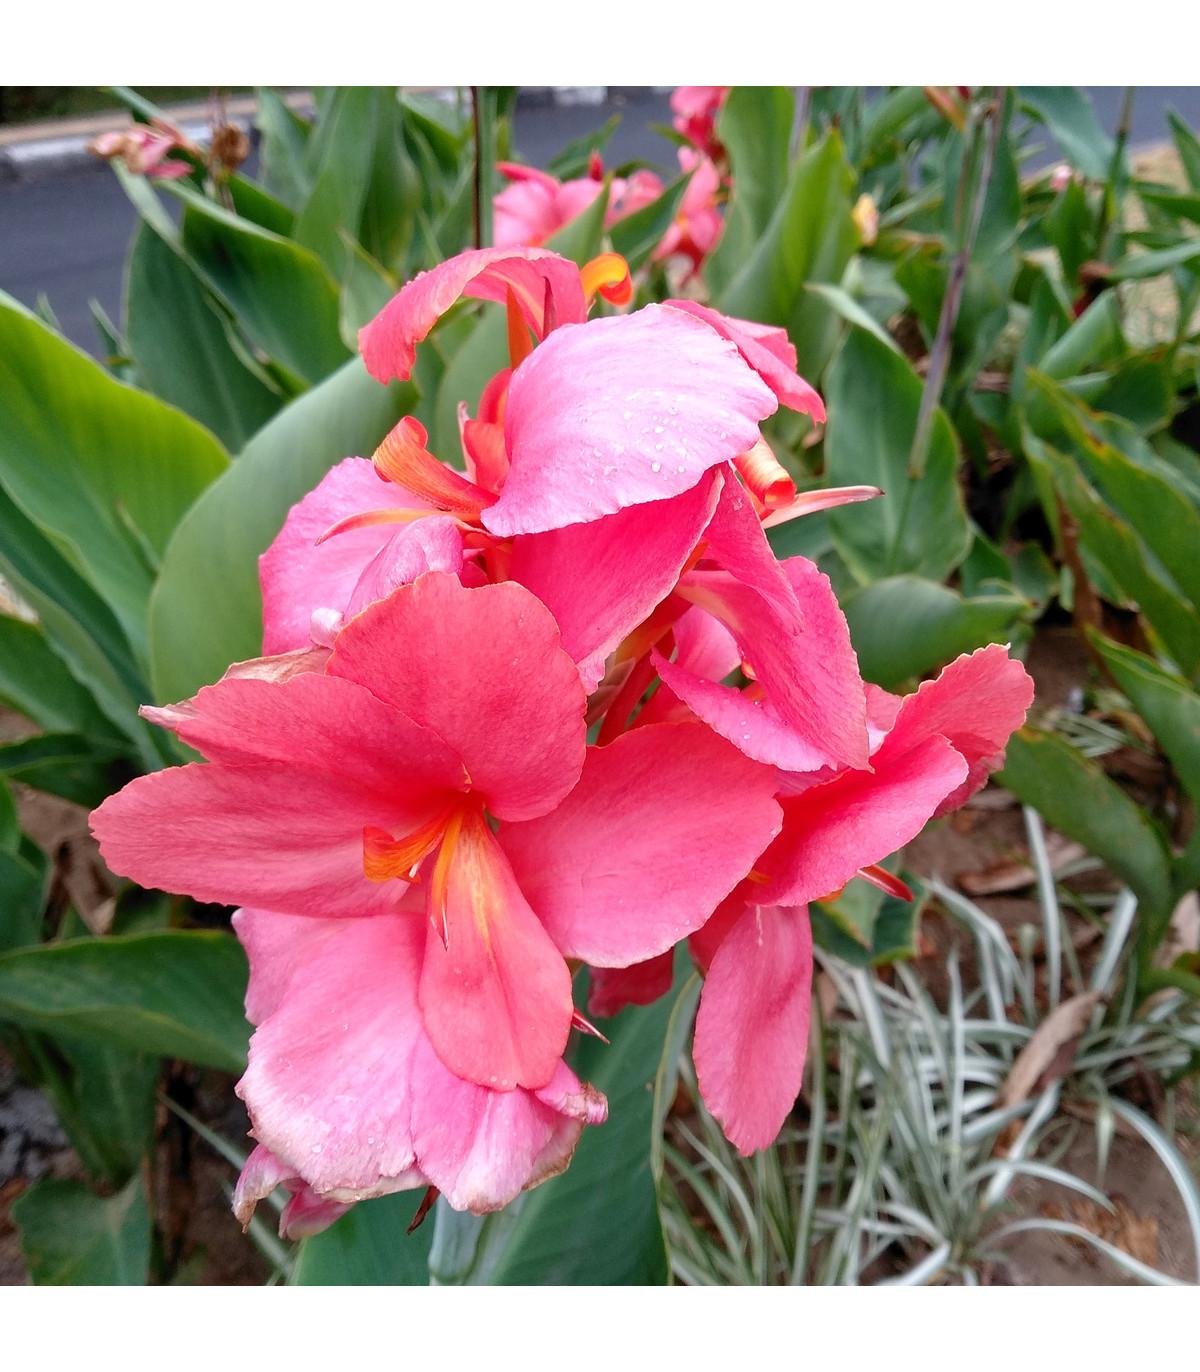 Kana ružová La Boheme - Canna - cibuľoviny - 1 ks